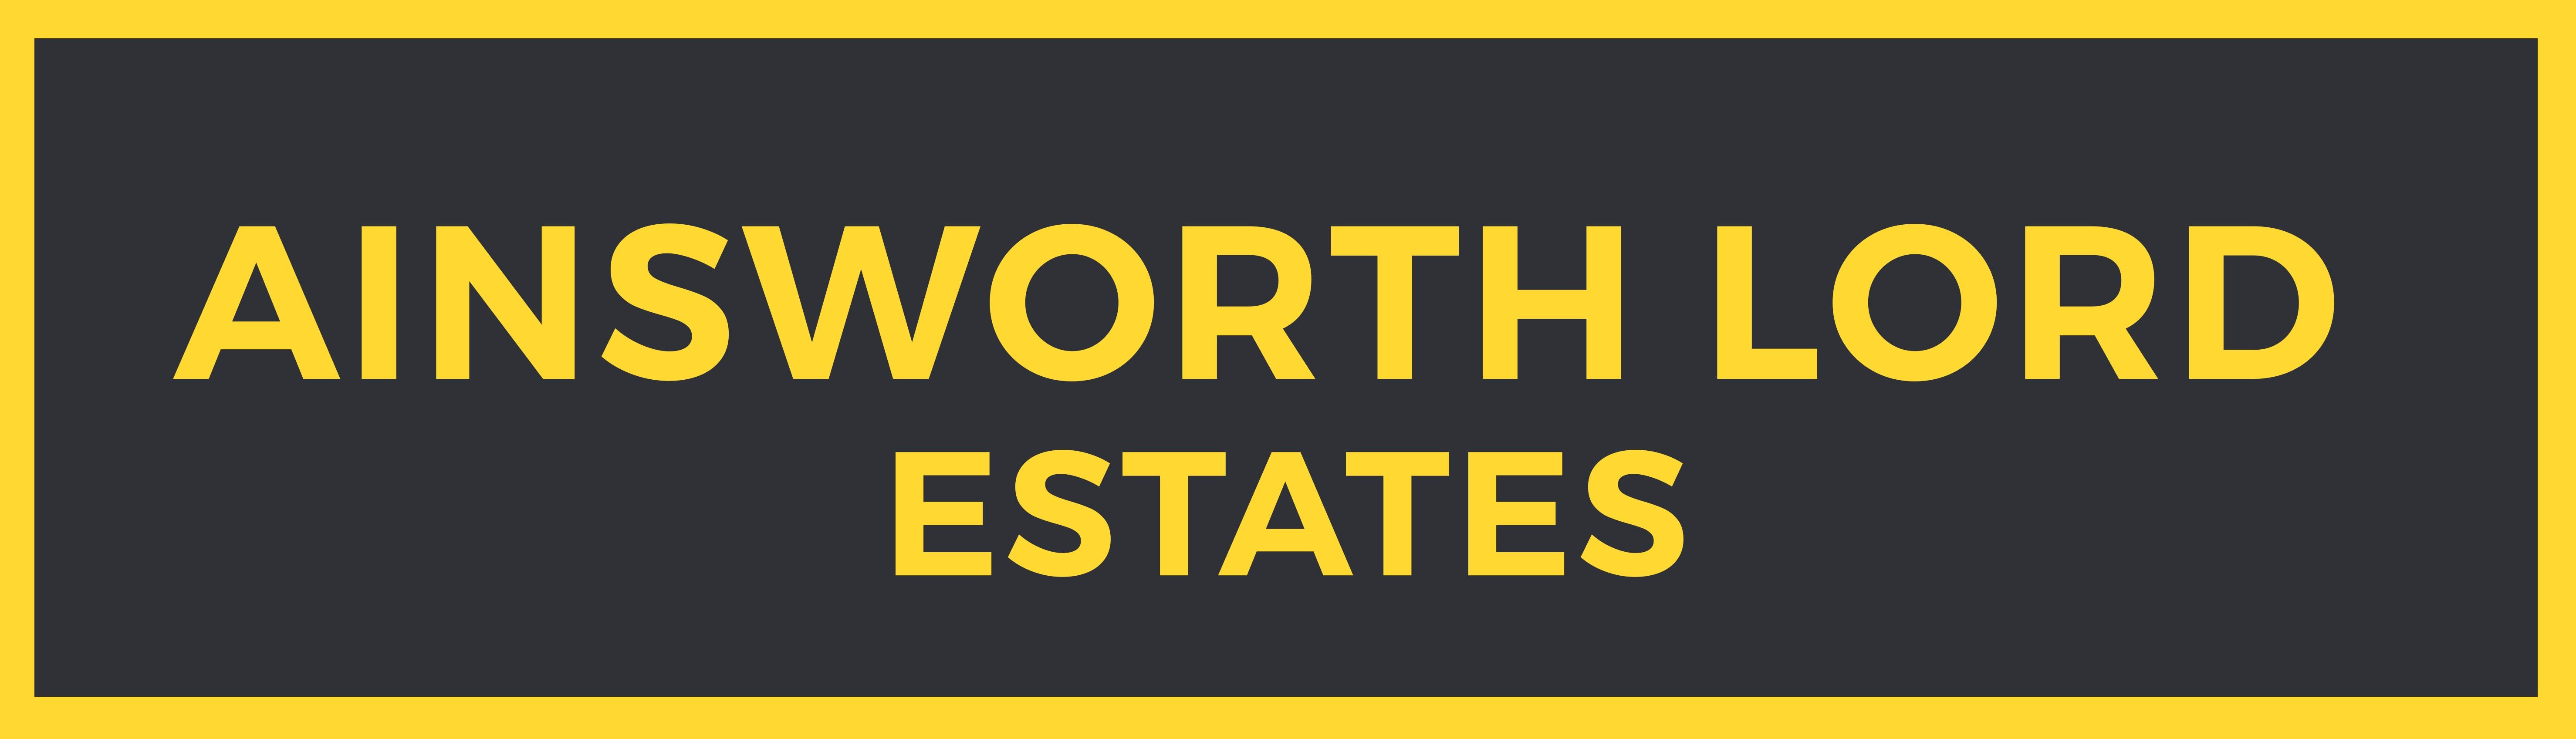 Ainsworth-Lord Estates - Blackburn